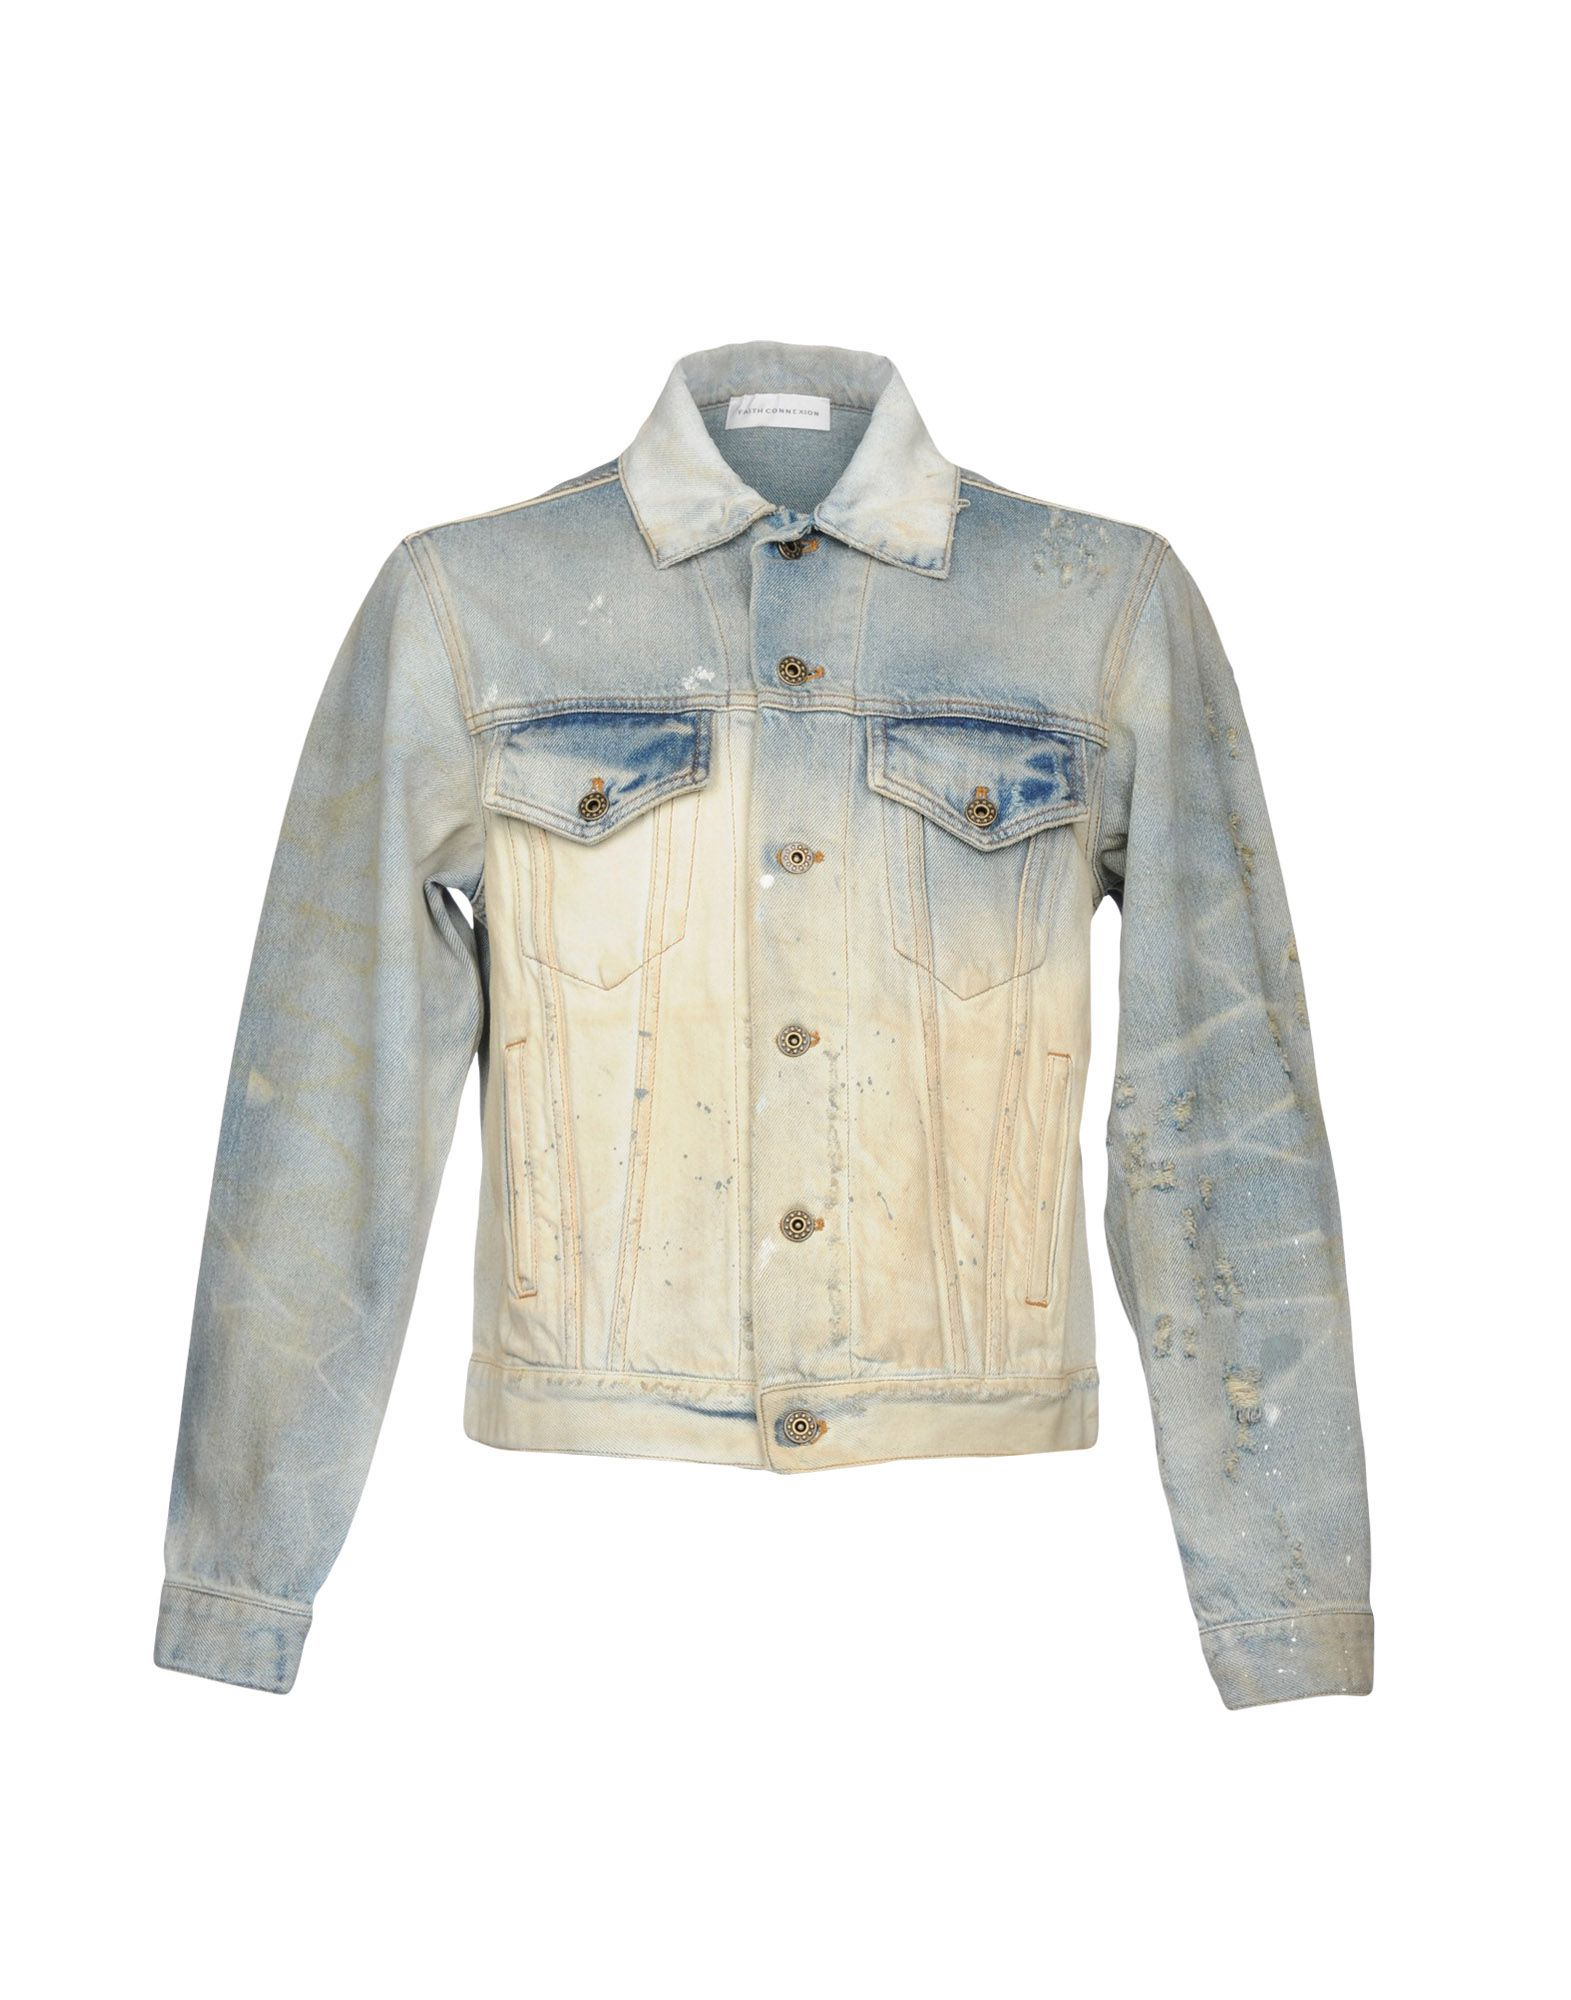 Giubbotto Jeans Faith Connexion Uomo - Acquista online su